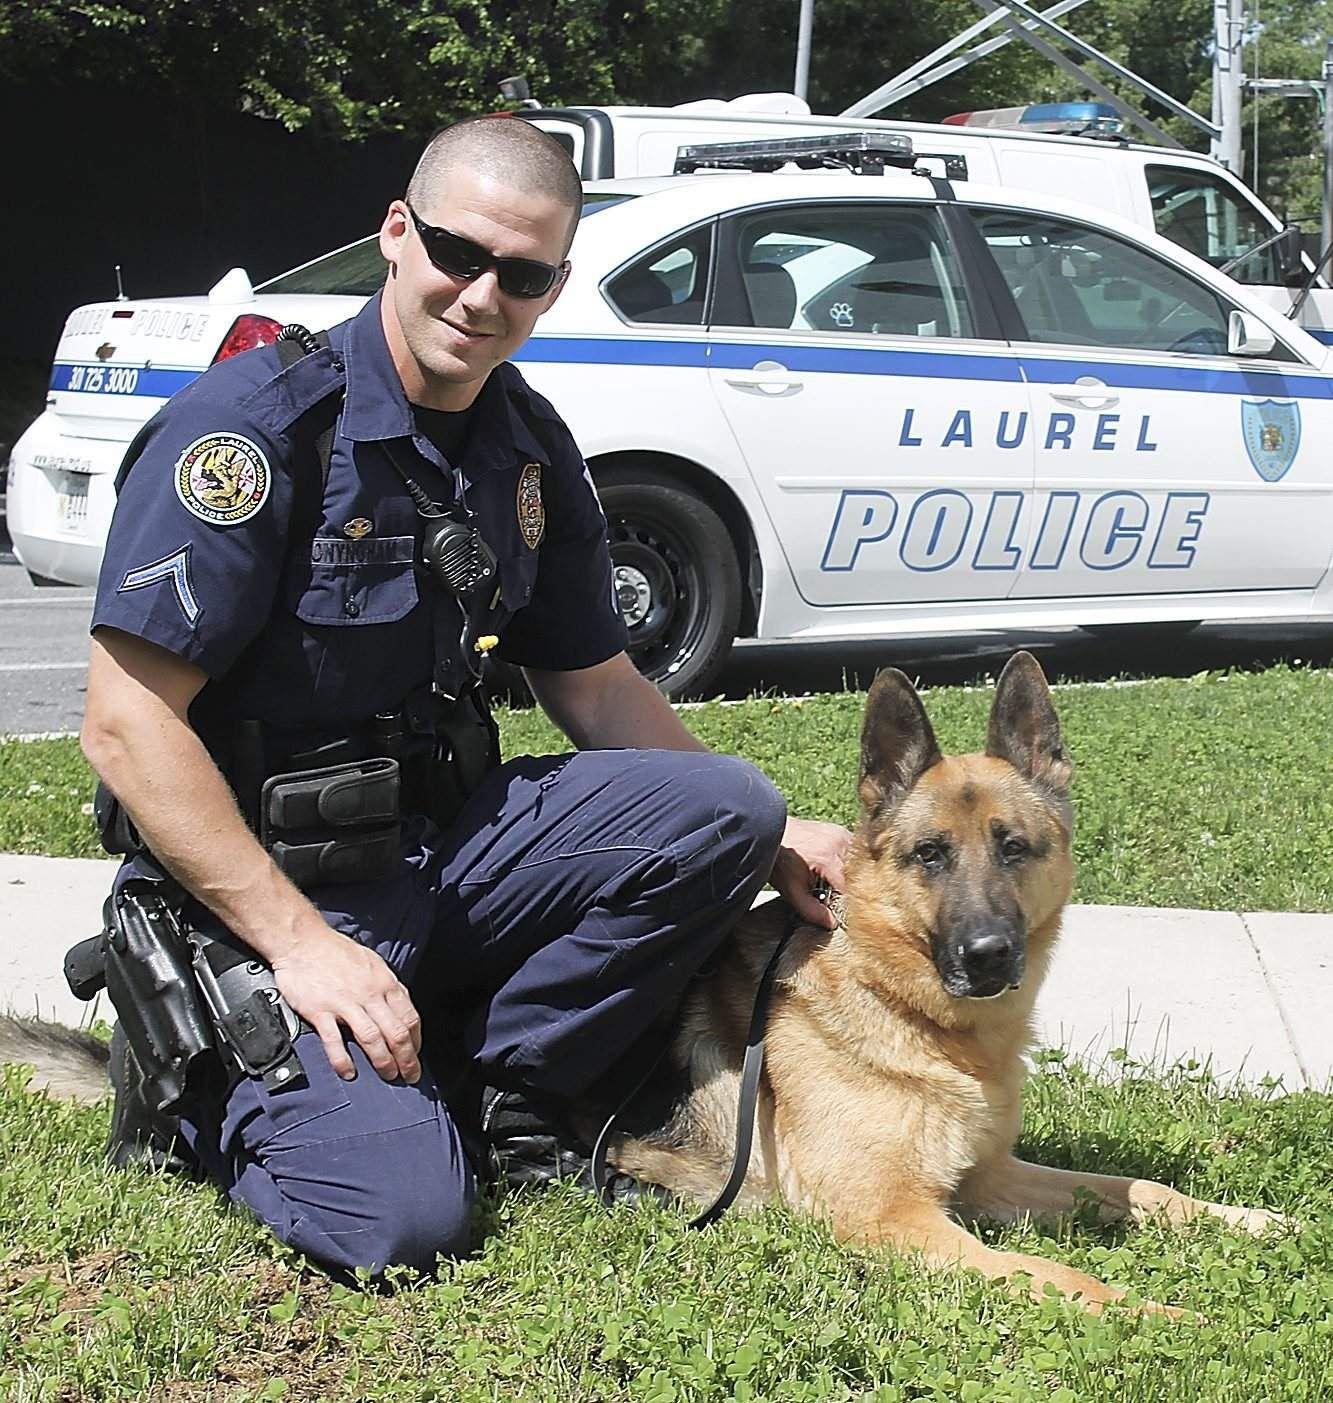 Laurel police maryland law enforcement police